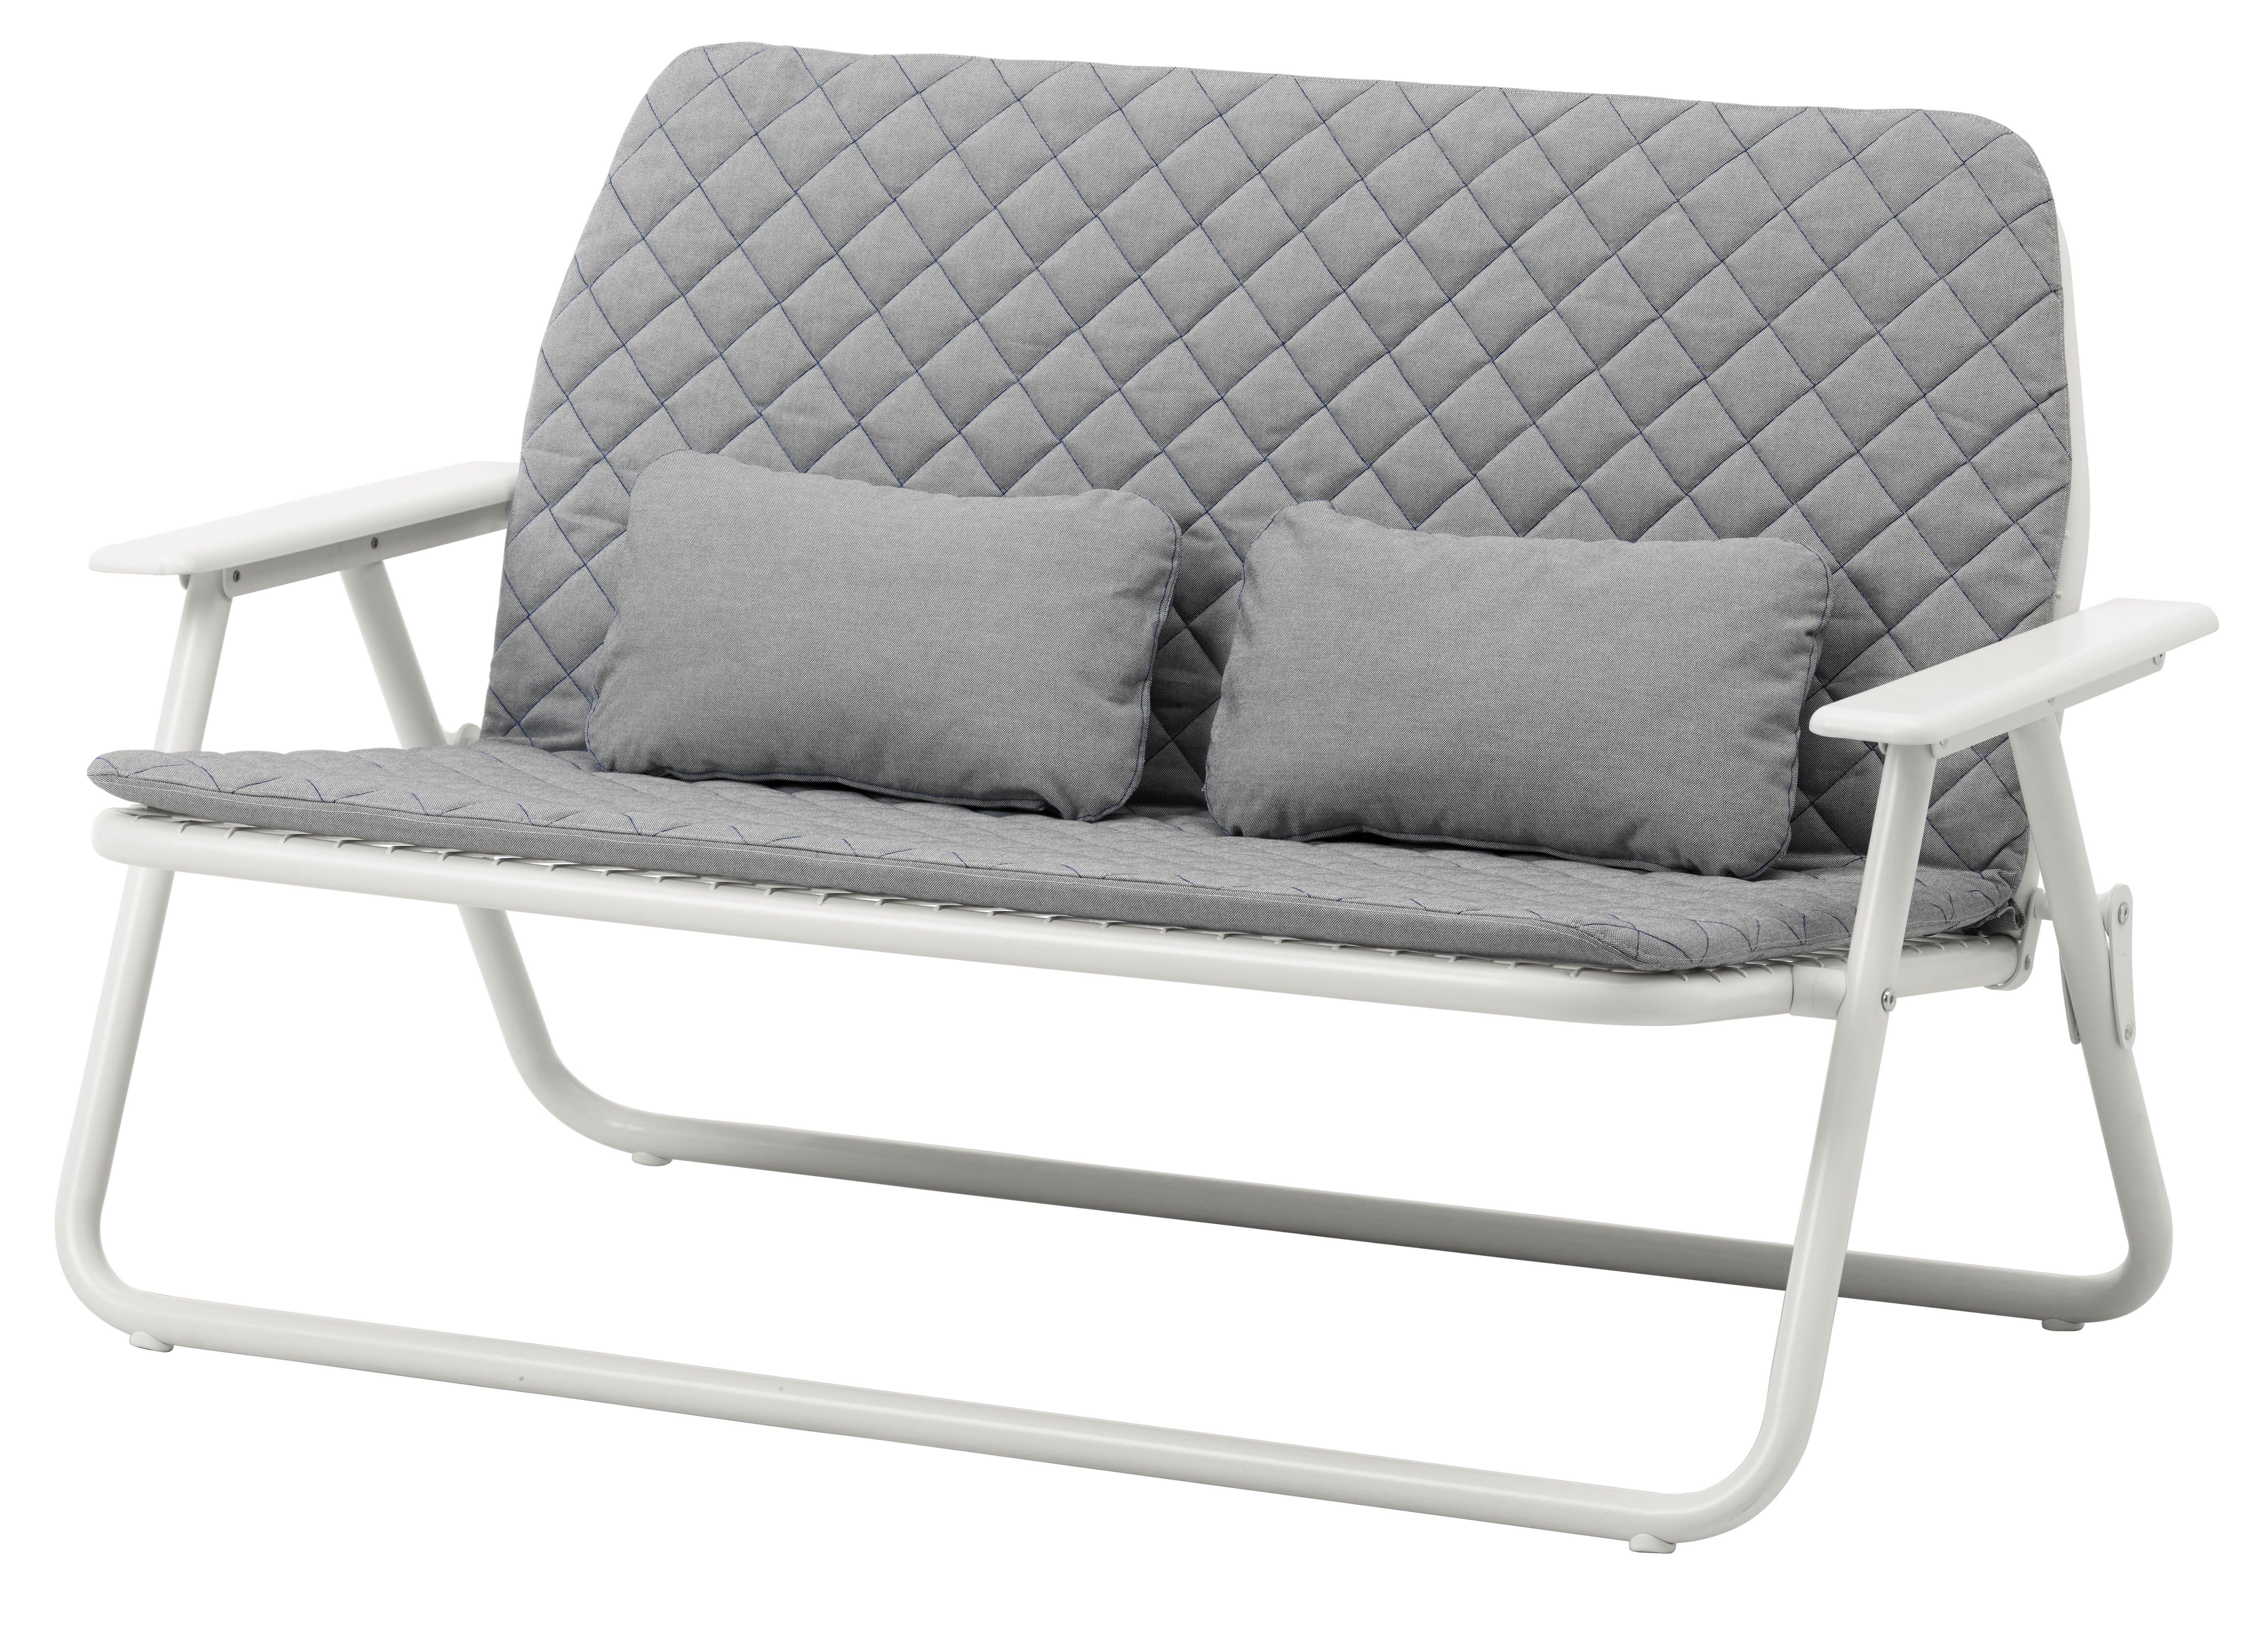 Brilliant Ikeas New Ps 2017 Collection Is Here Its A Happy Modern Inzonedesignstudio Interior Chair Design Inzonedesignstudiocom